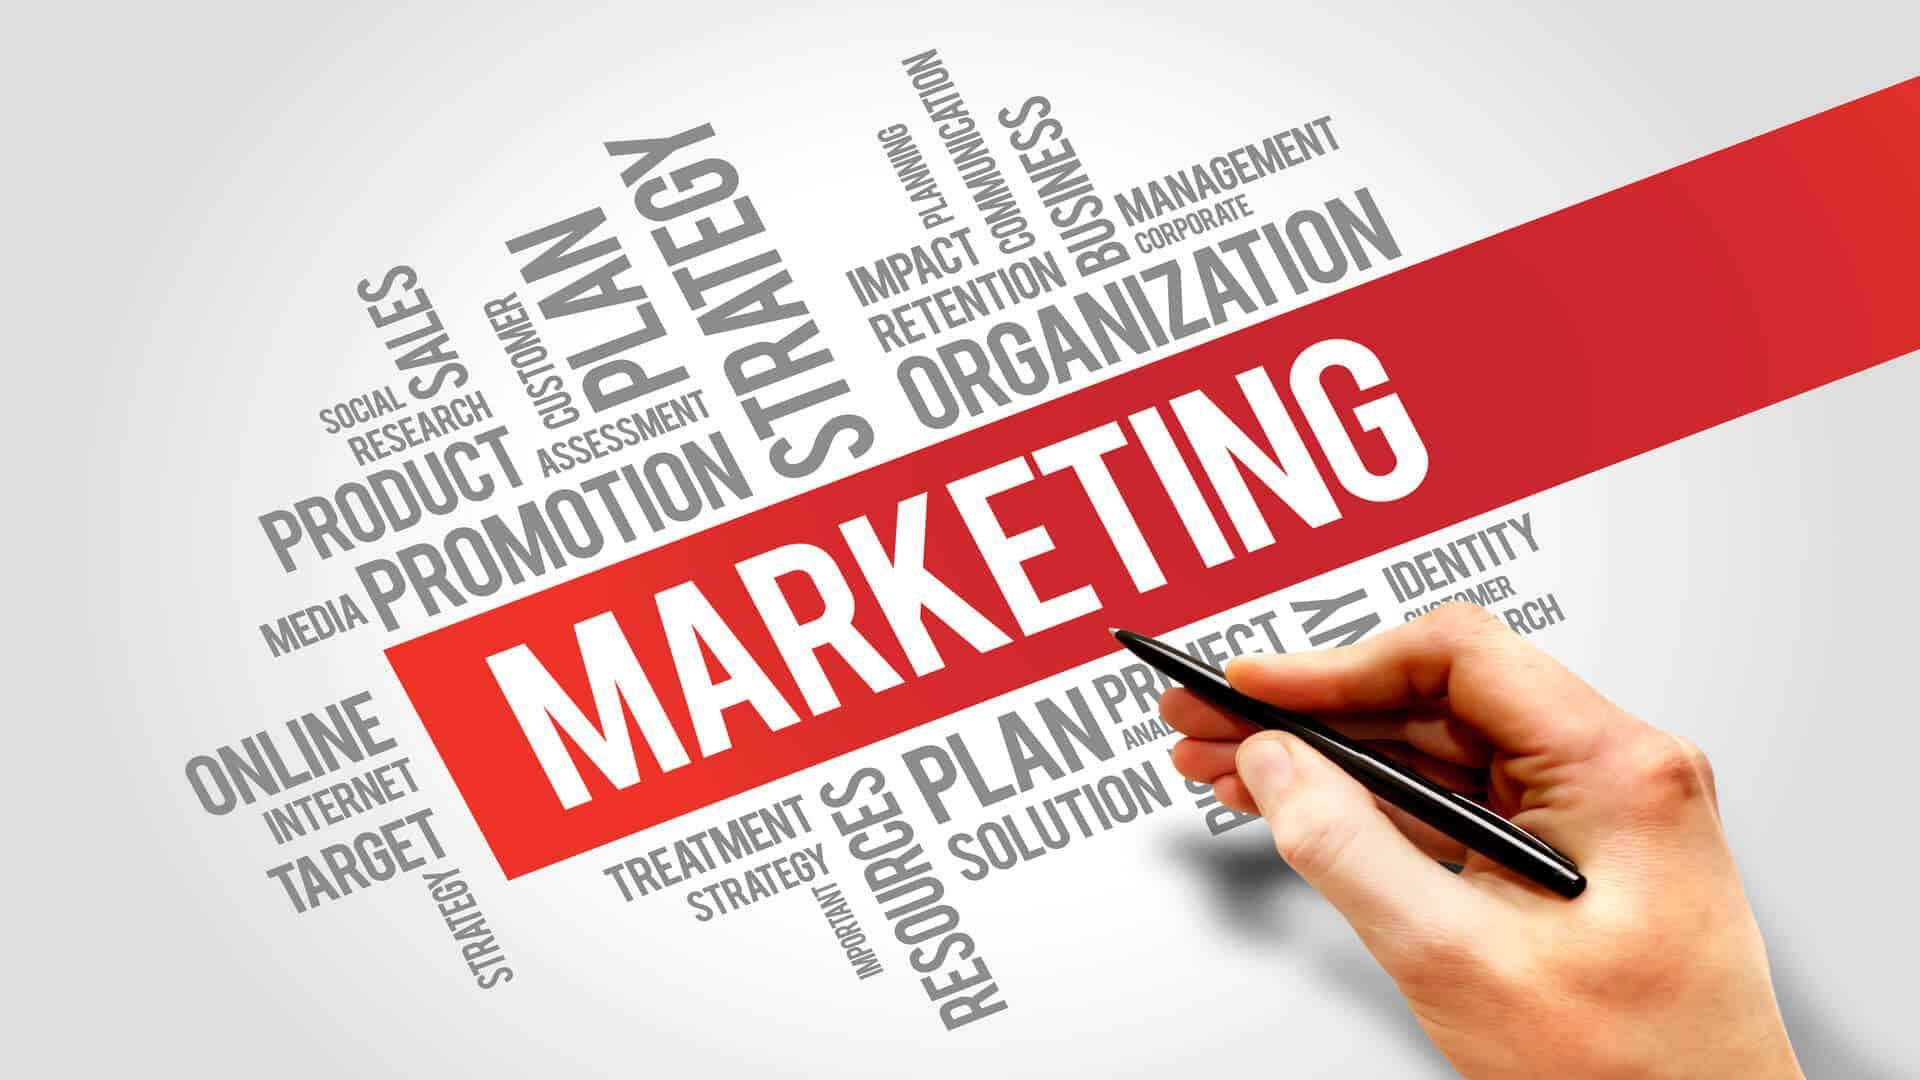 Agence de communication: marketing